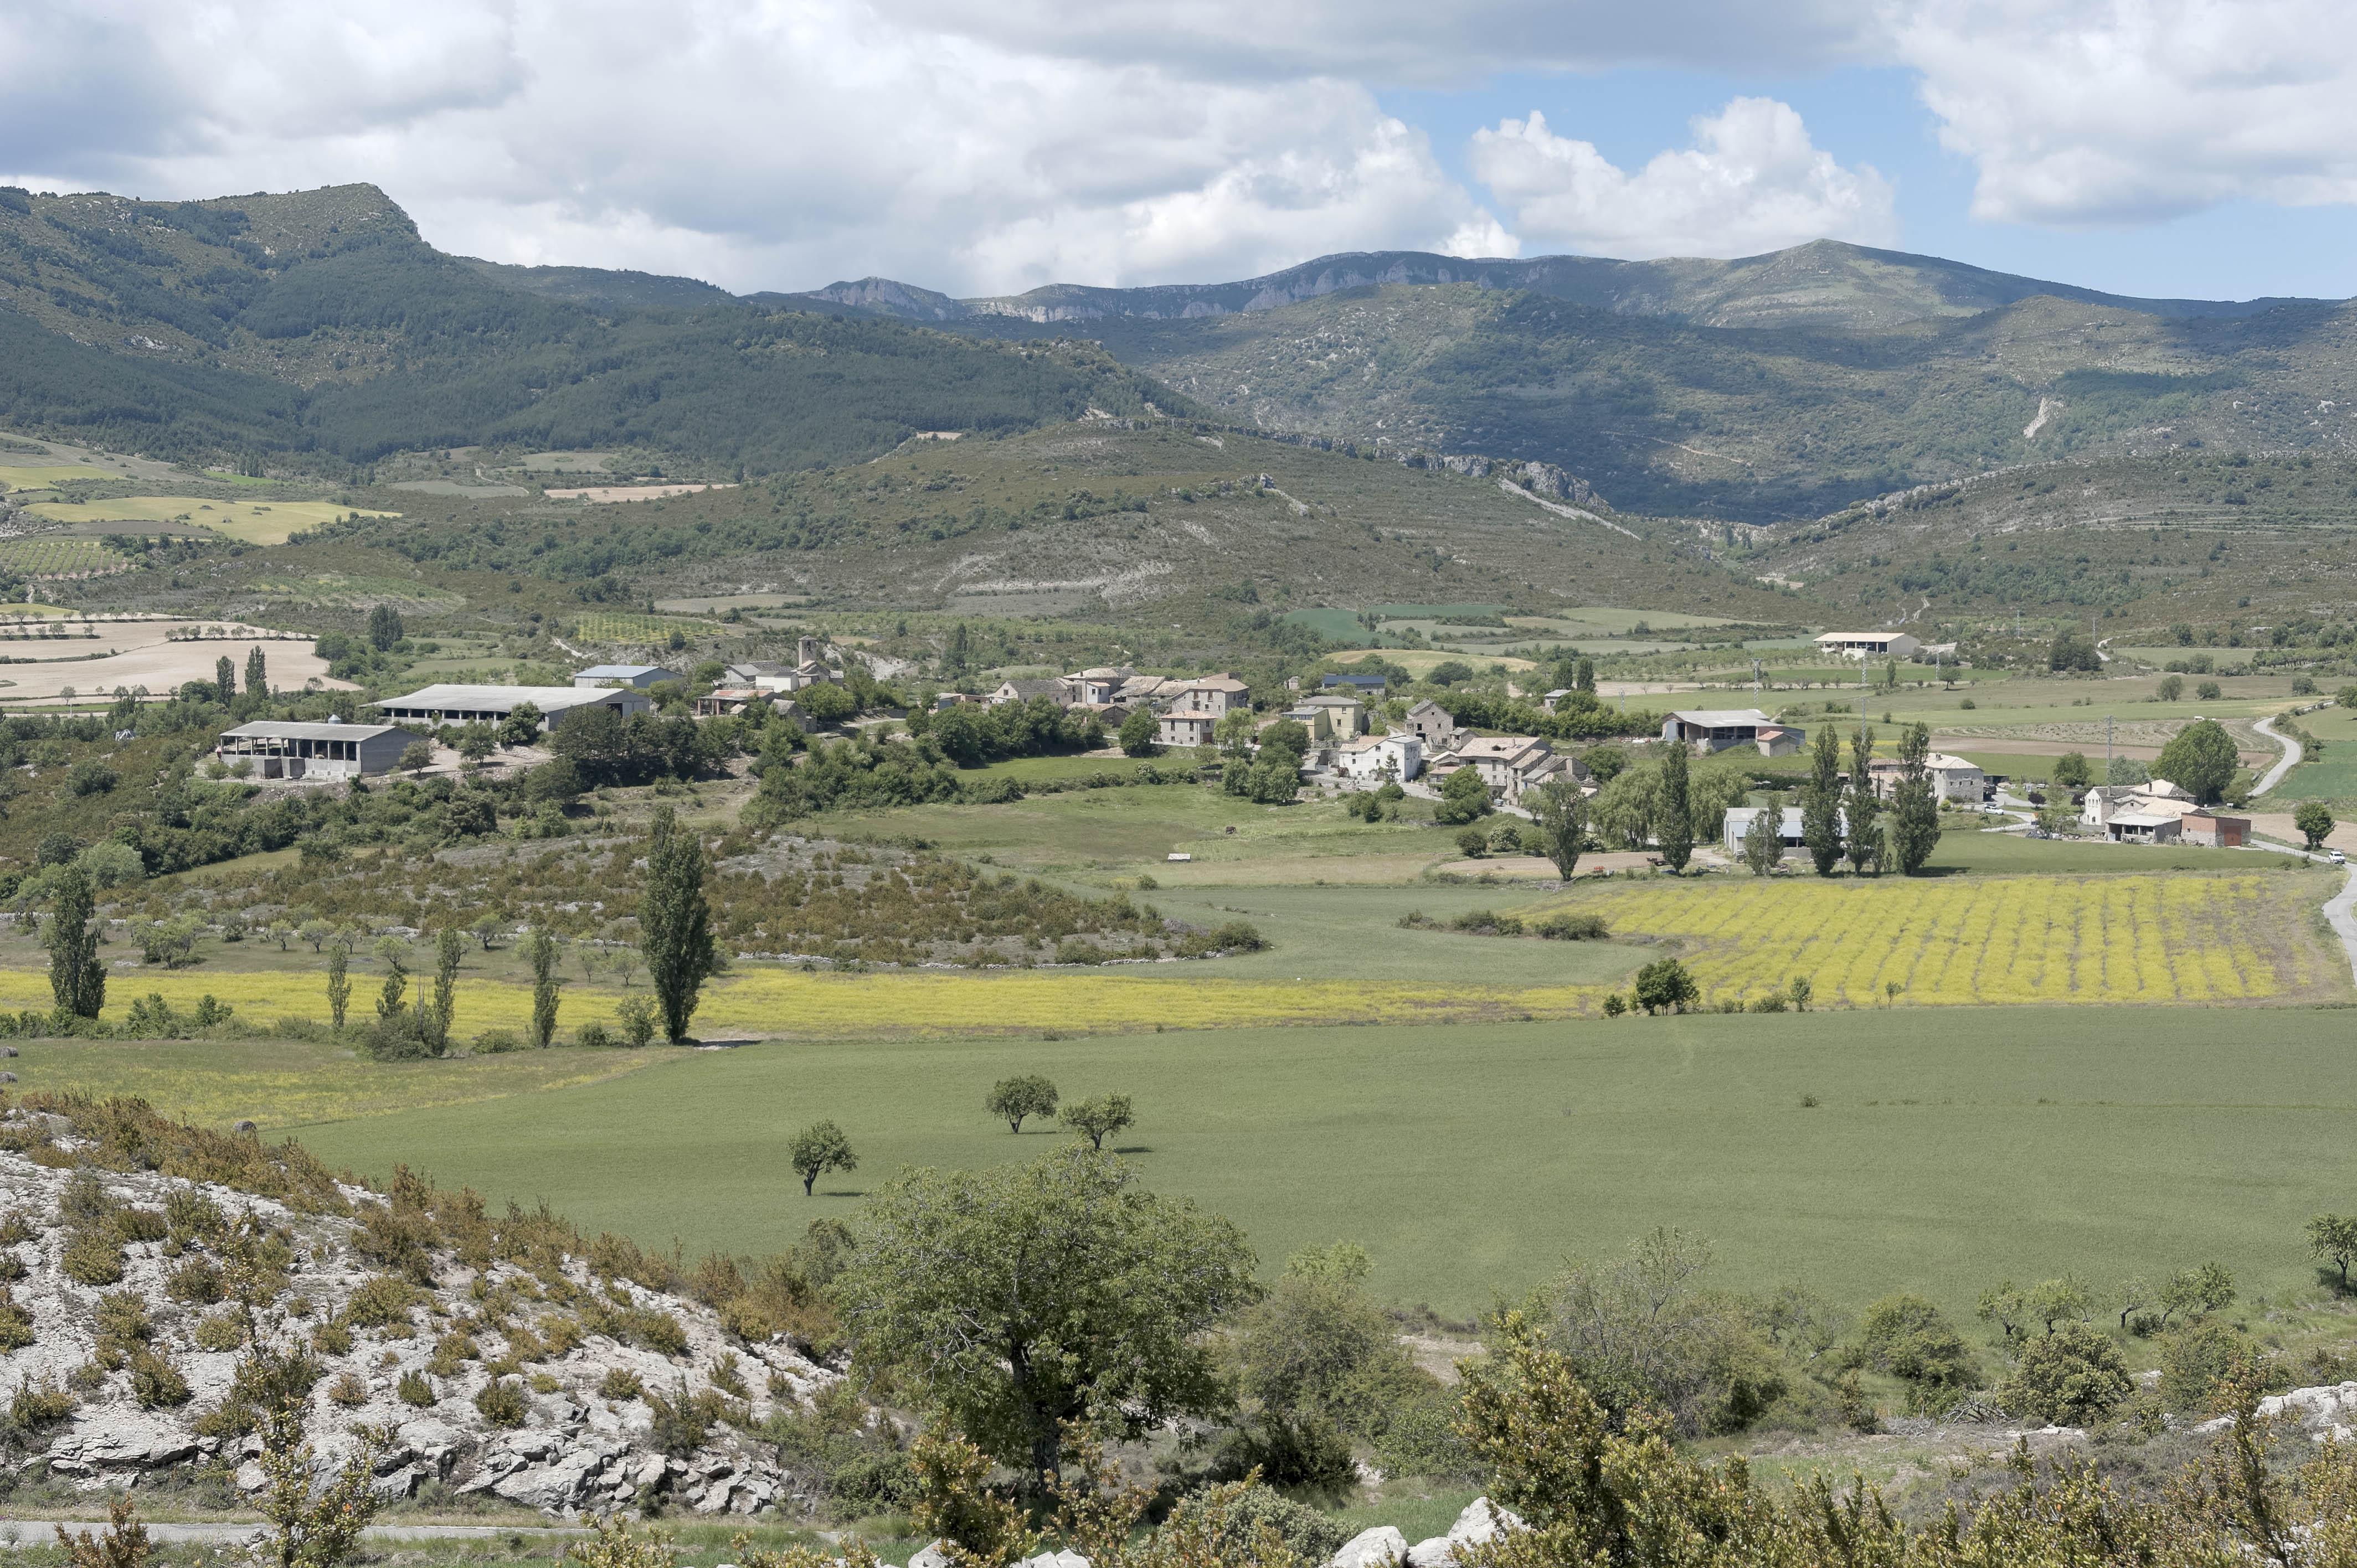 6766_Paules de Sarsa (Sobrarbe)